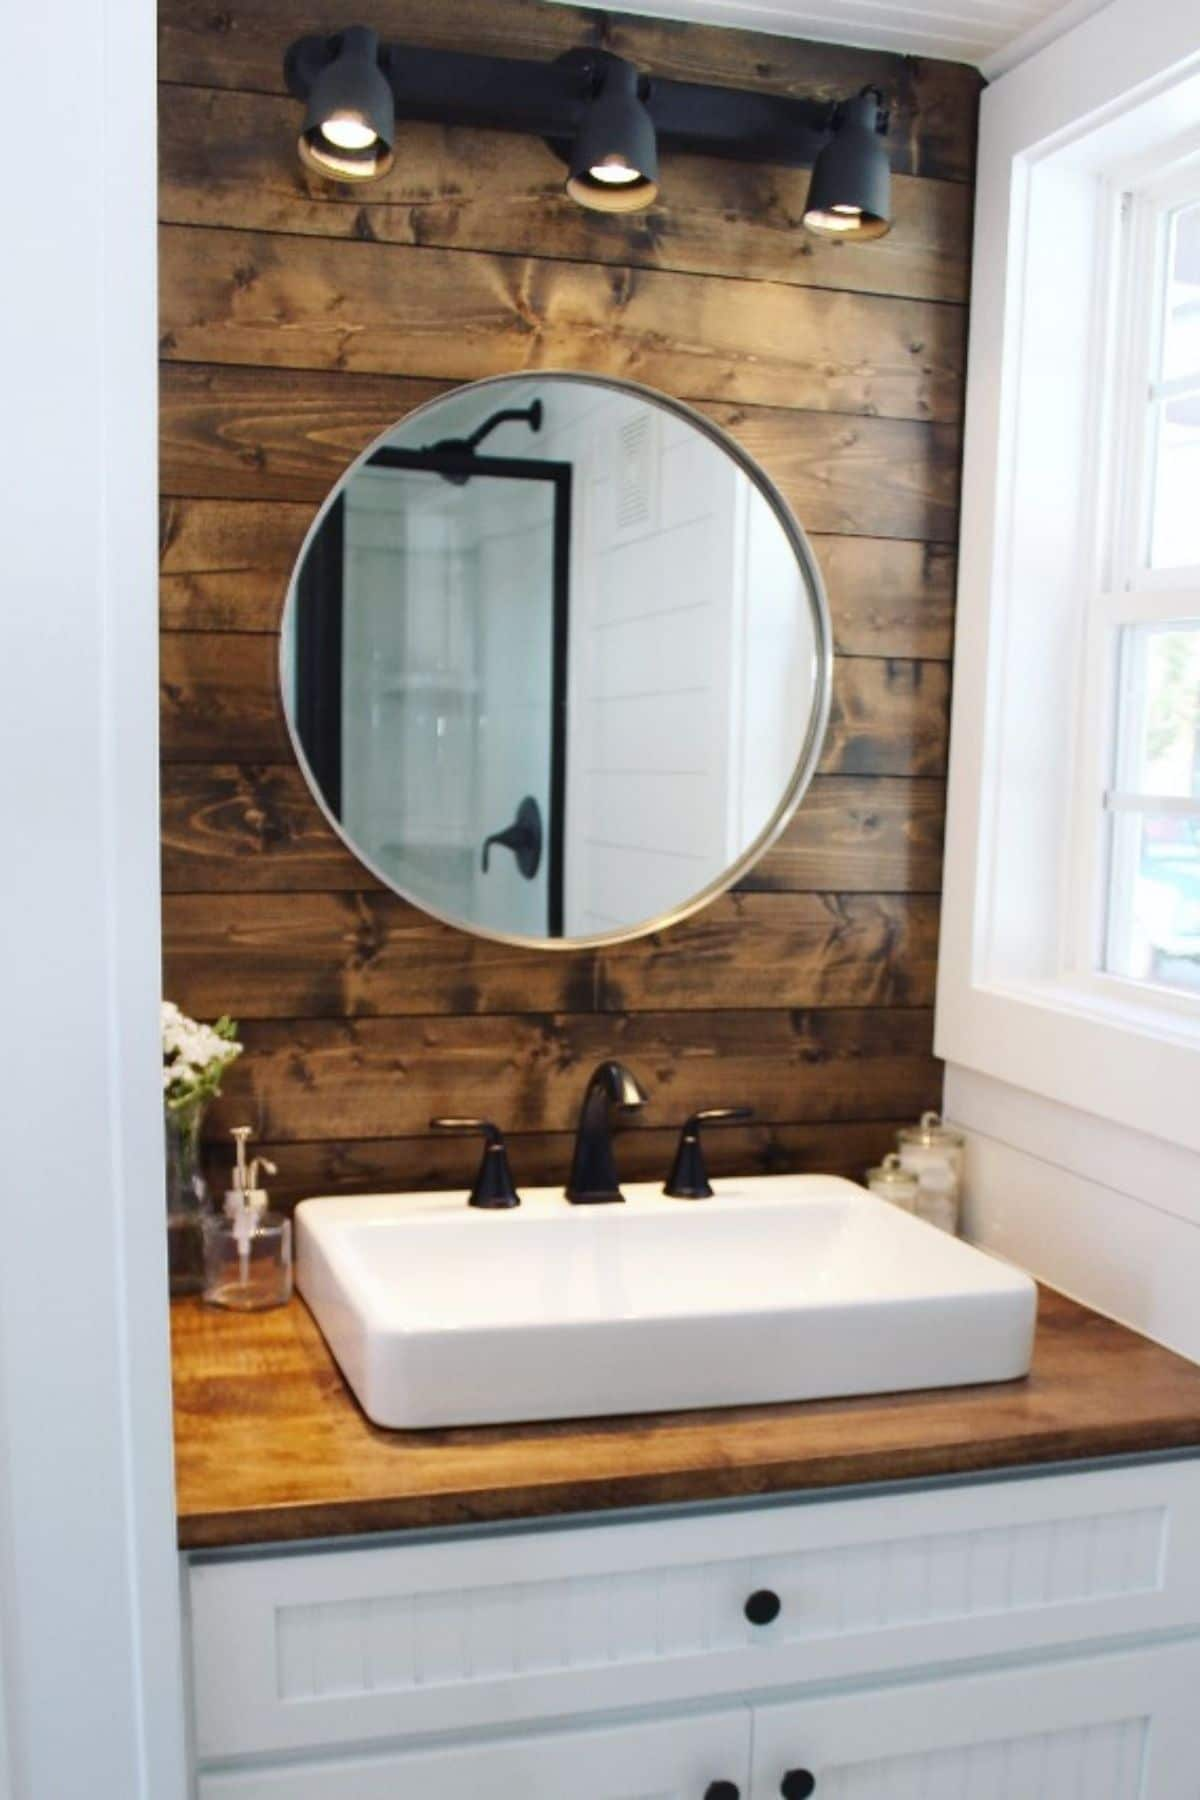 Bathroom sink in woodgrain sink with white cabinet below and round mirror above